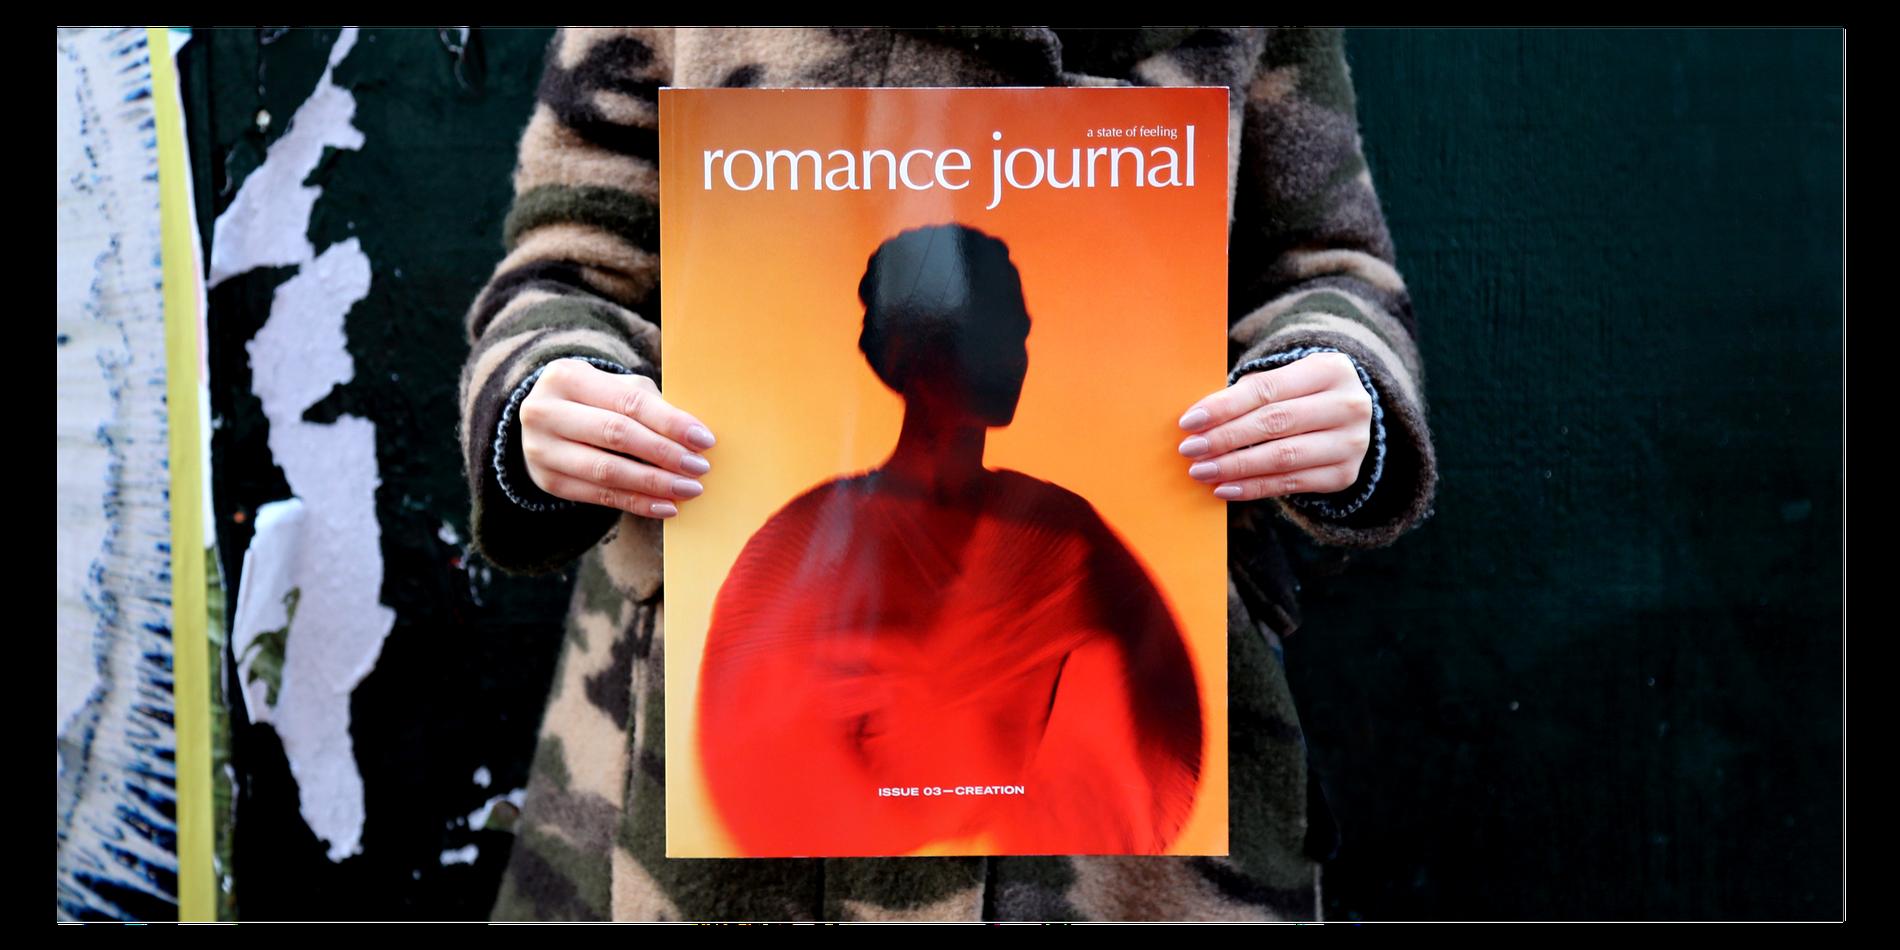 RomanceJournal-01.png